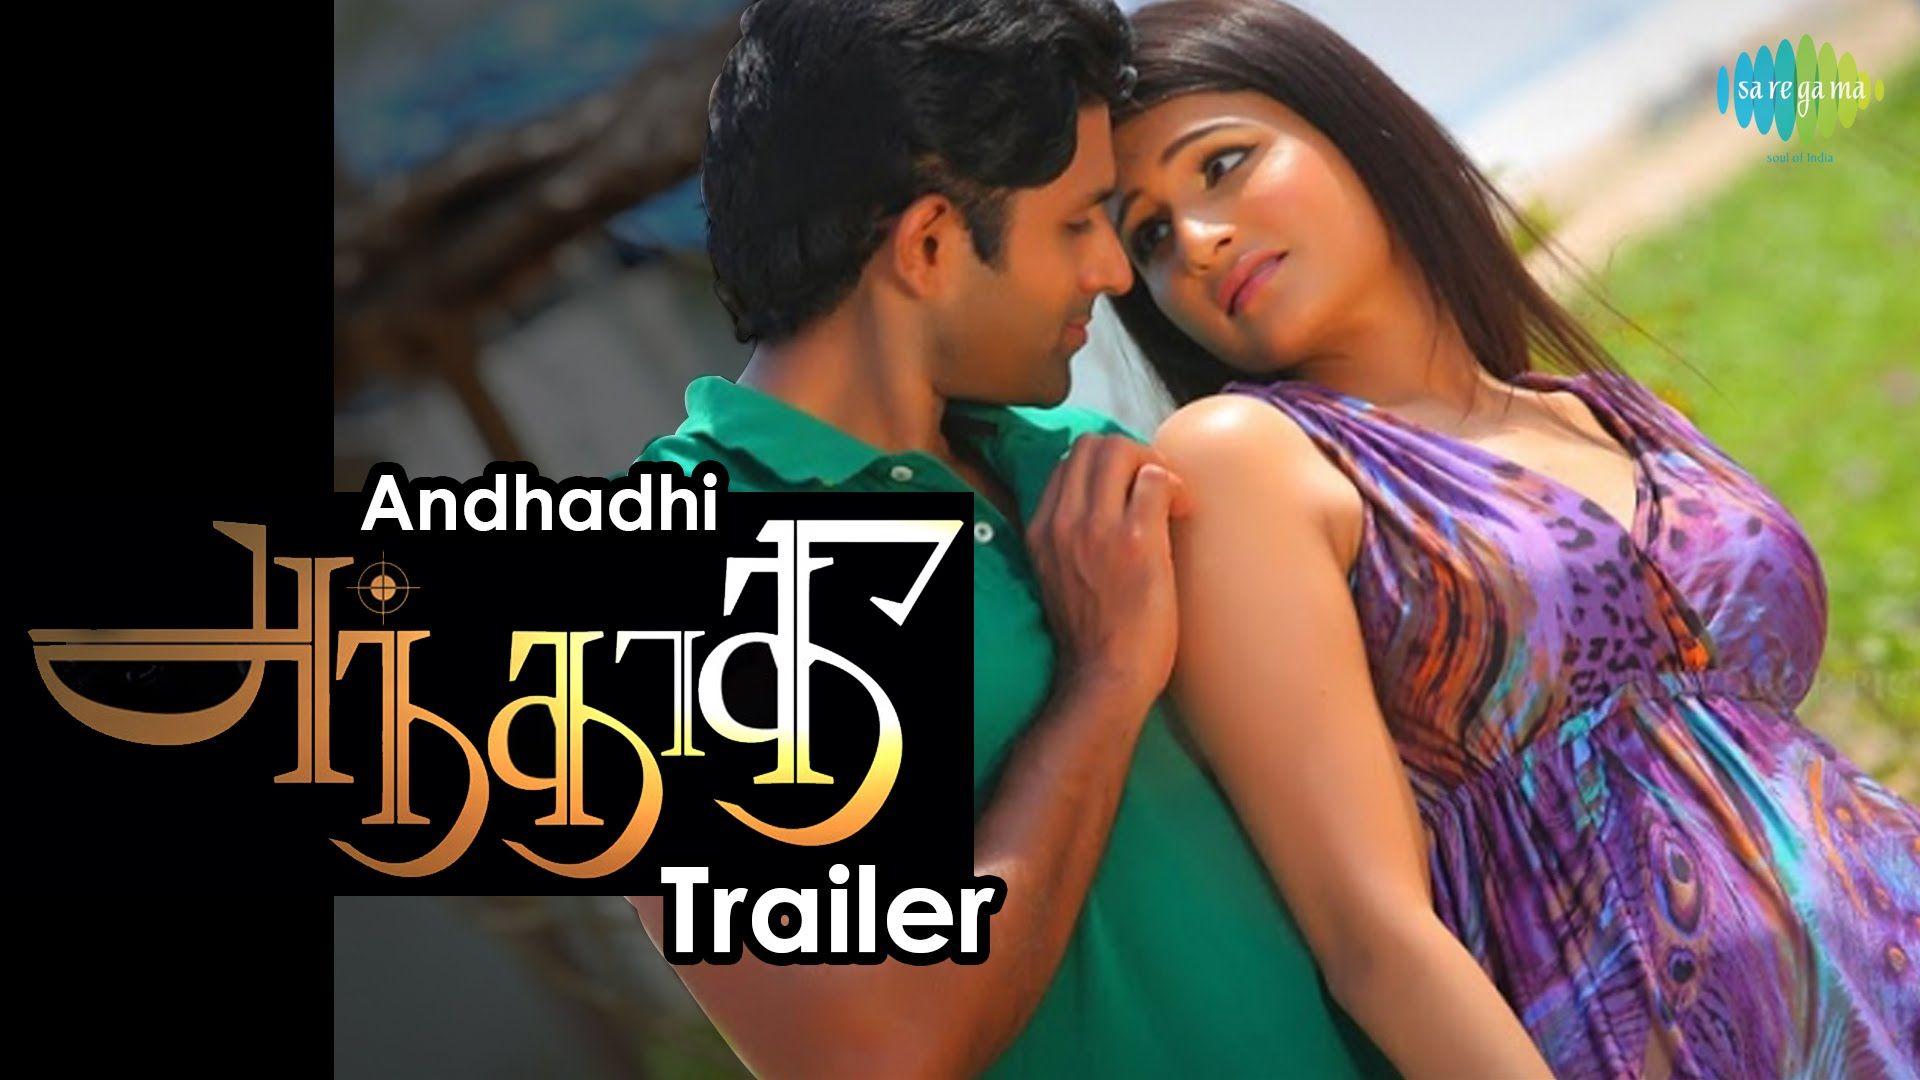 tamil new movies download isaimini.com